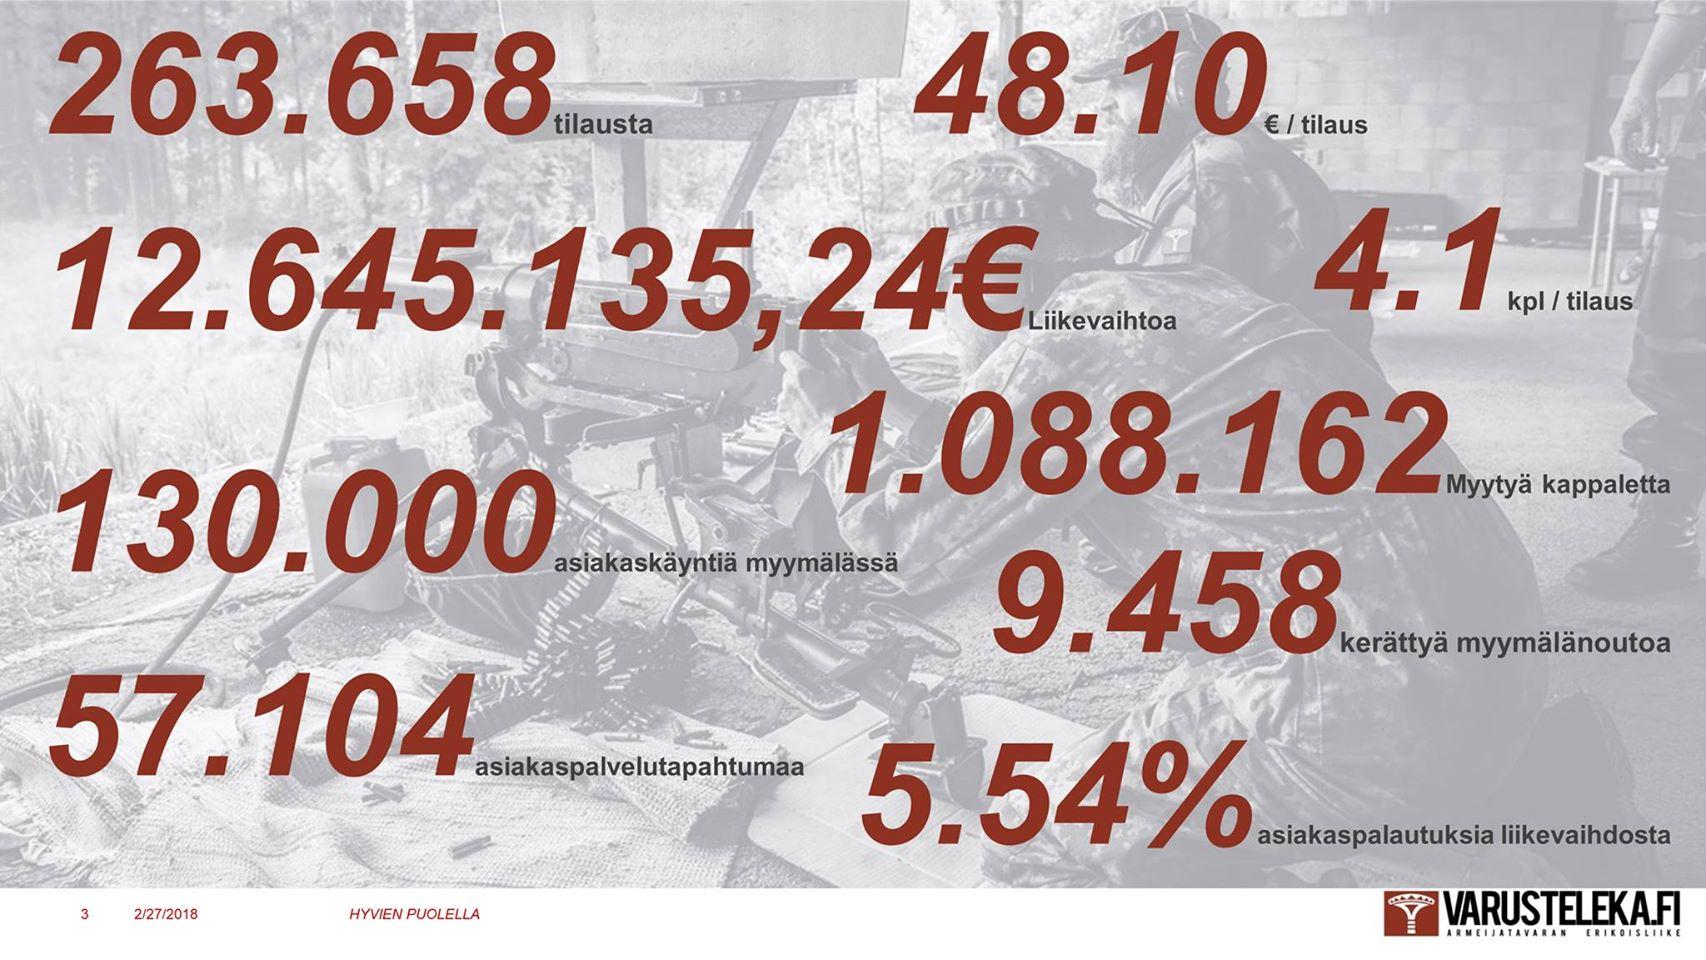 Varusteleka Profit Report 2017